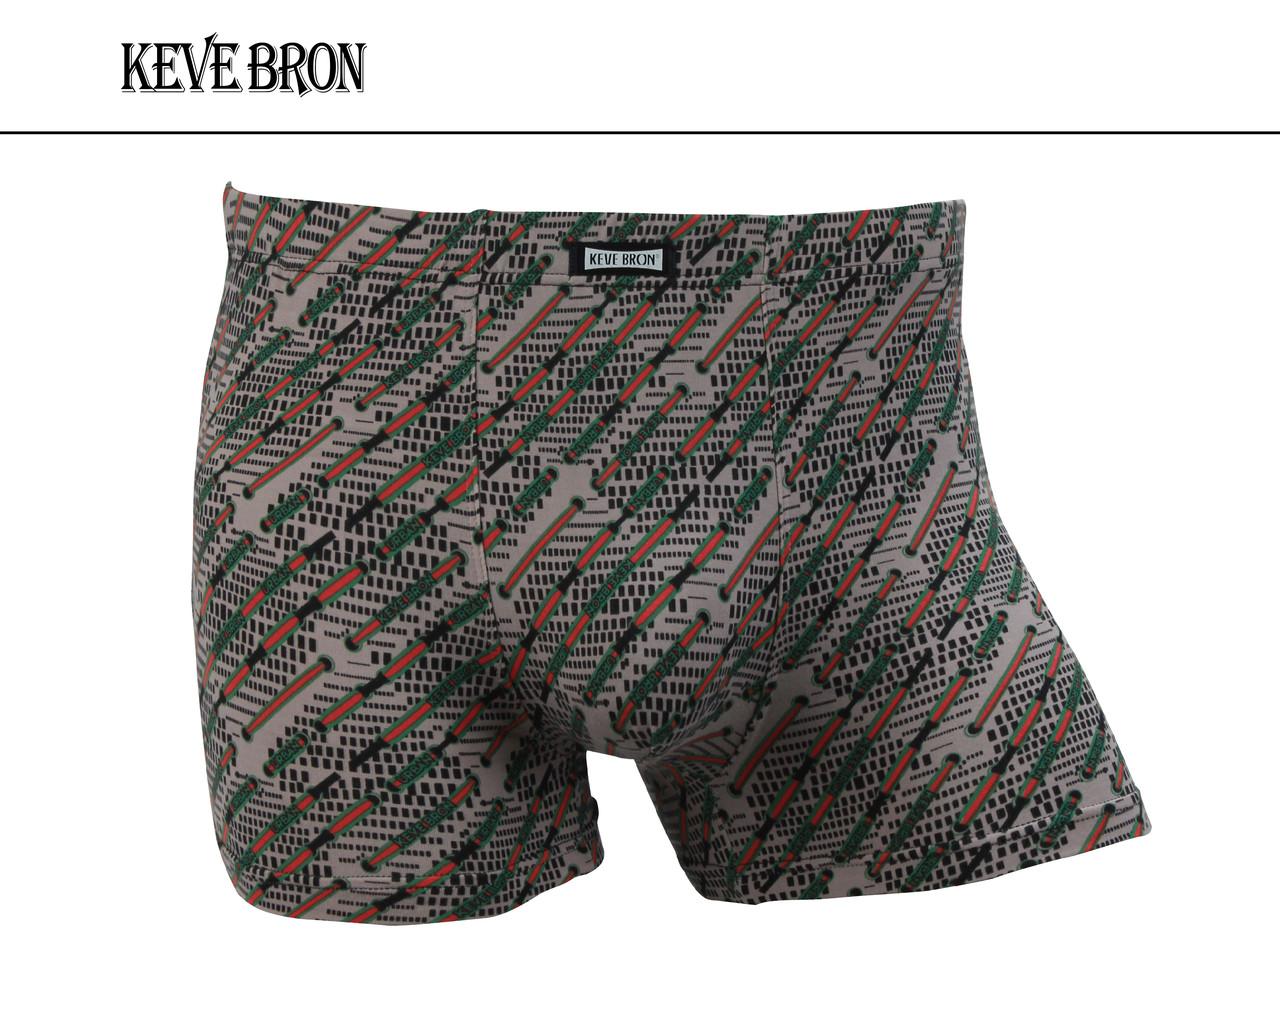 Мужские трусы боксеры KEVEBRON (XL-4XL)  Арт.KV09025